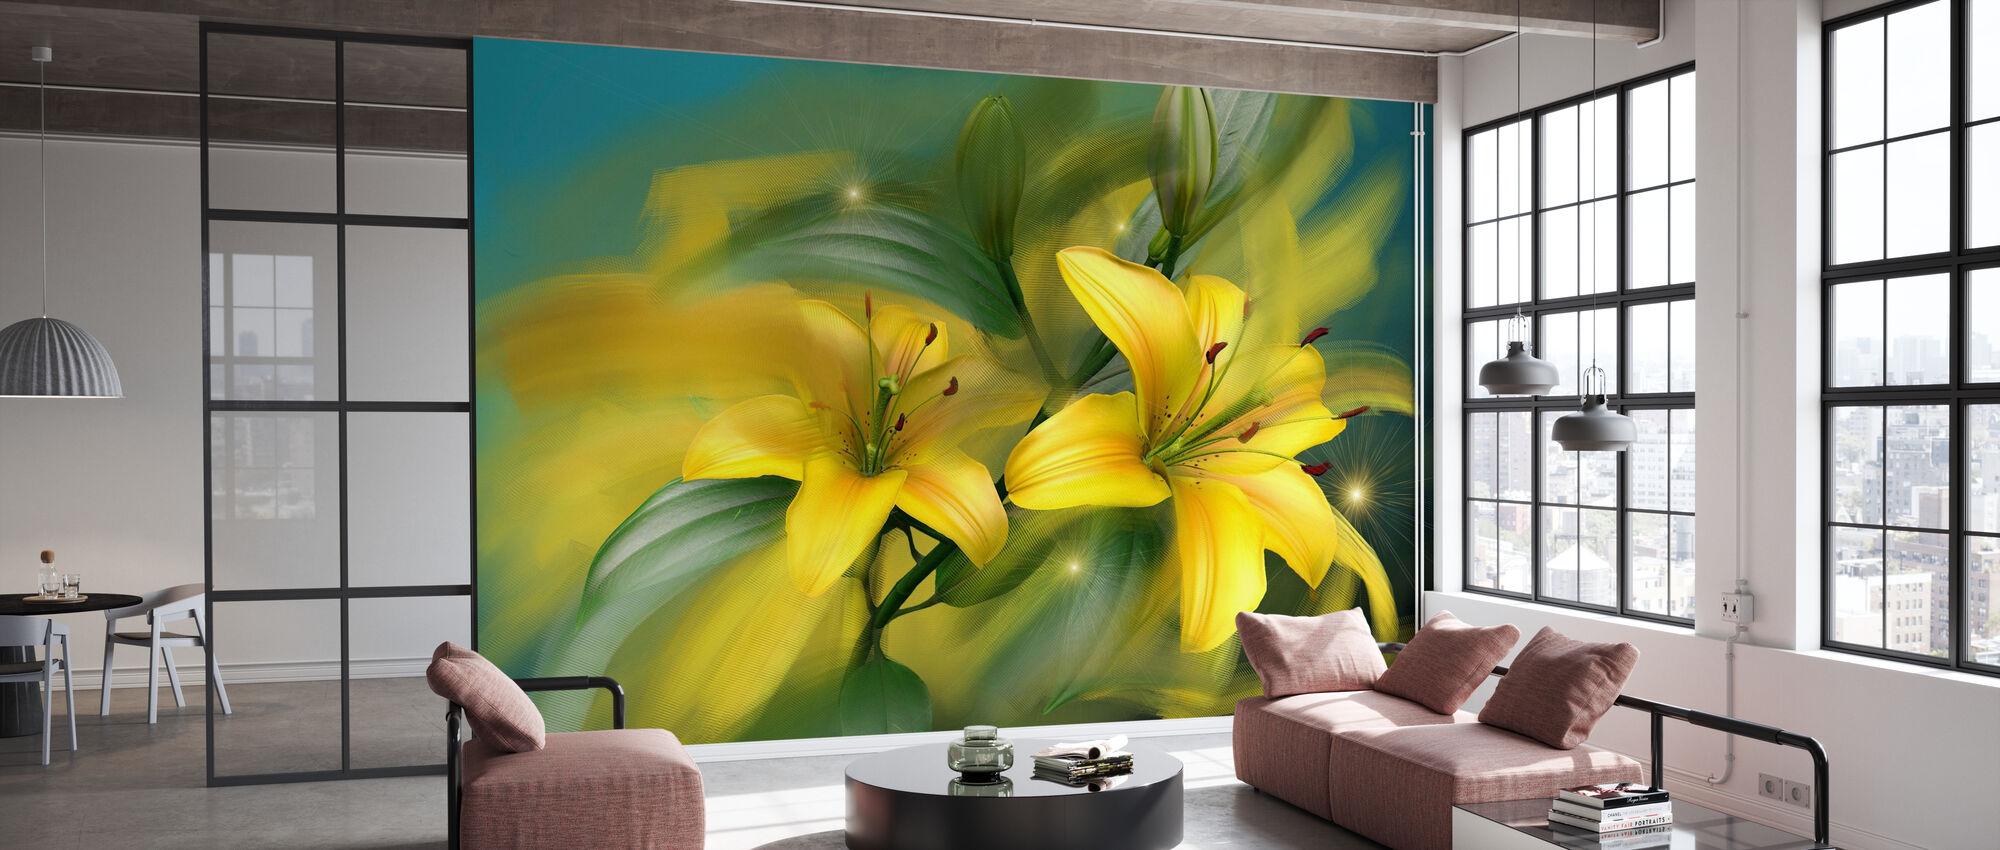 Flower Power - Wallpaper - Office